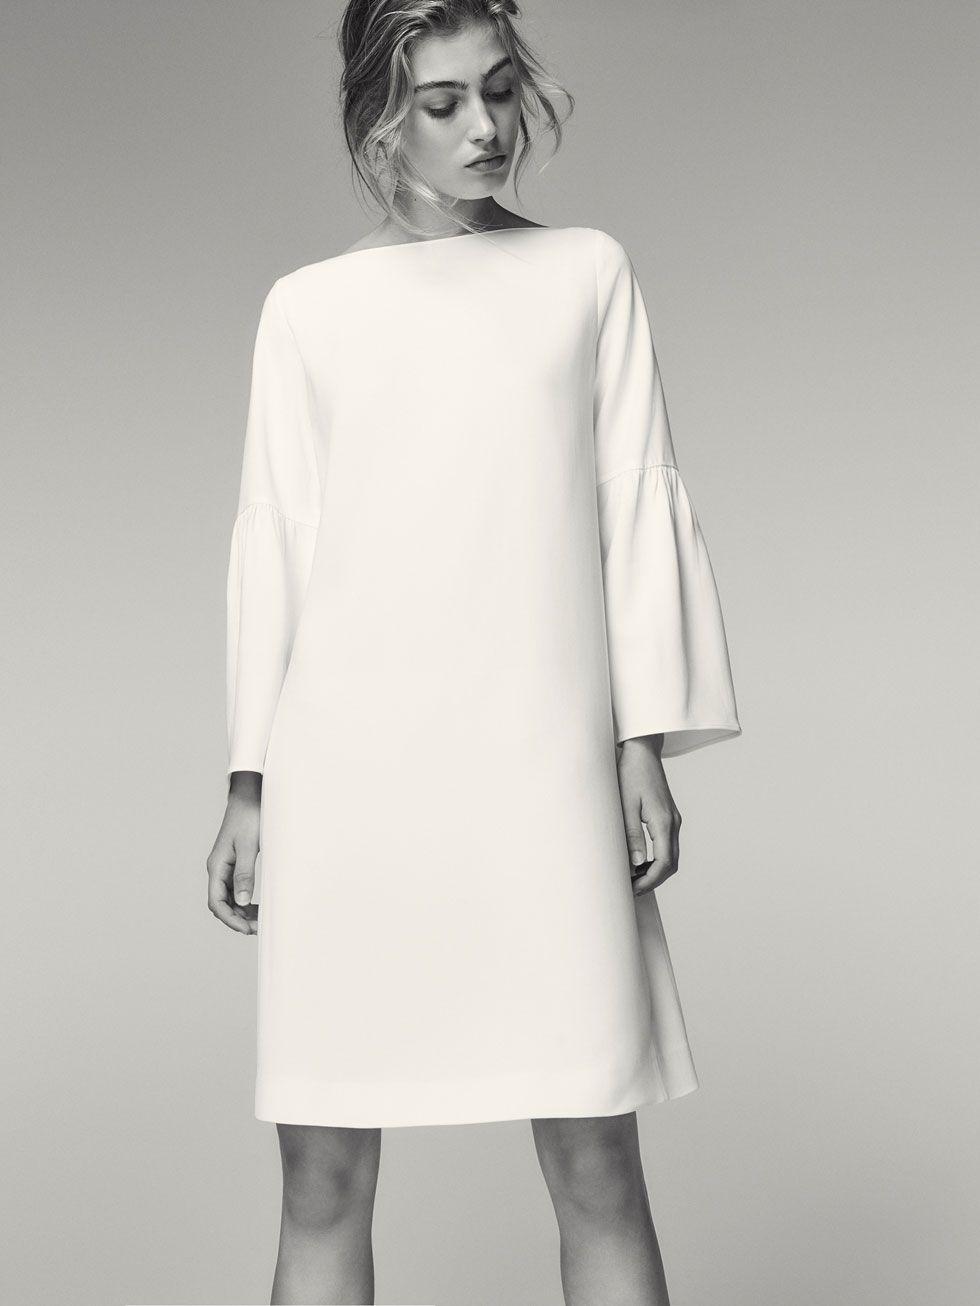 Massimo dutti mujer vestidos blancos